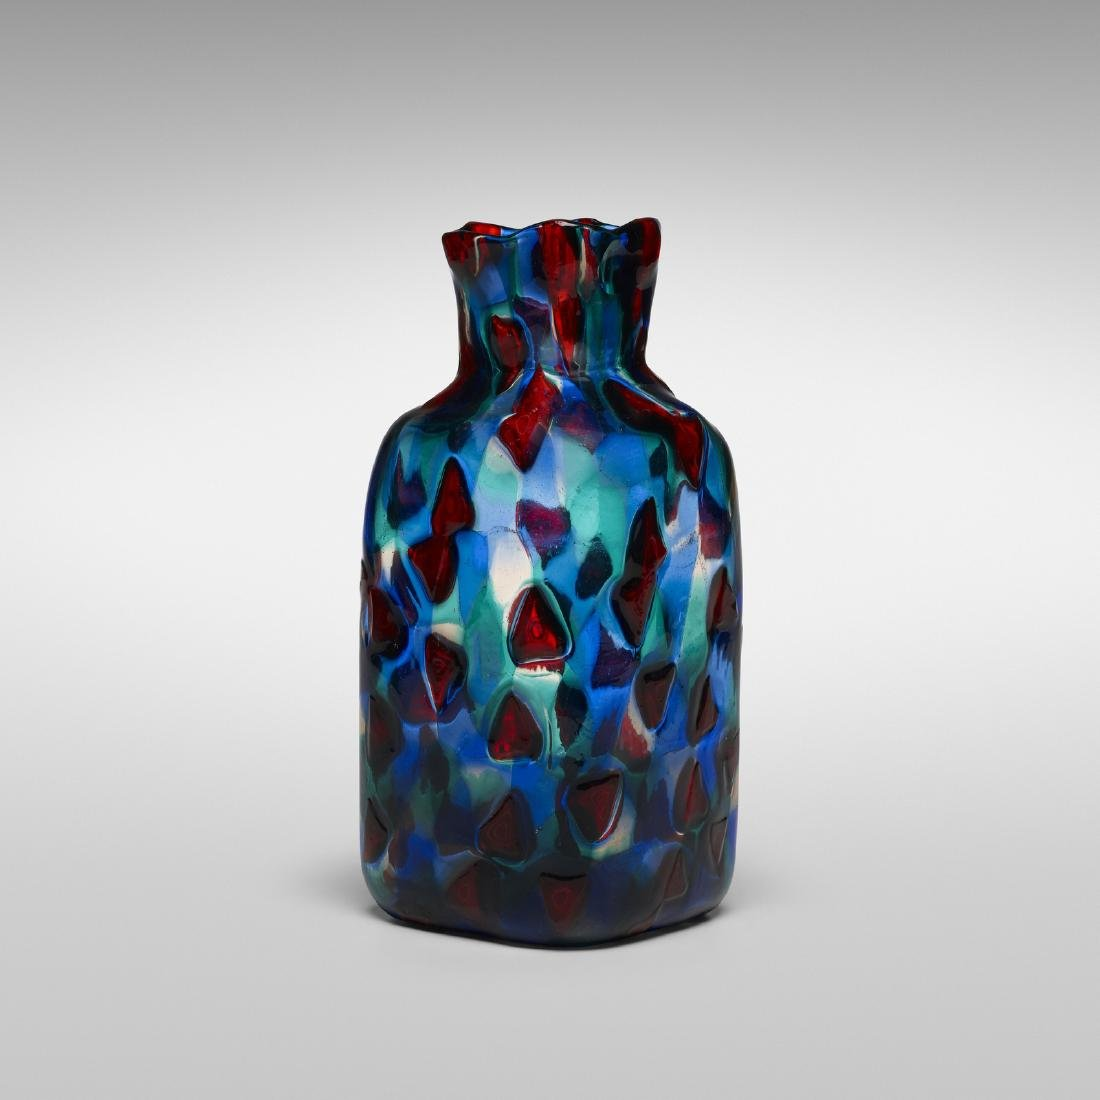 Fulvio Bianconi, Rare Pezzato vase, model 3541 - 2